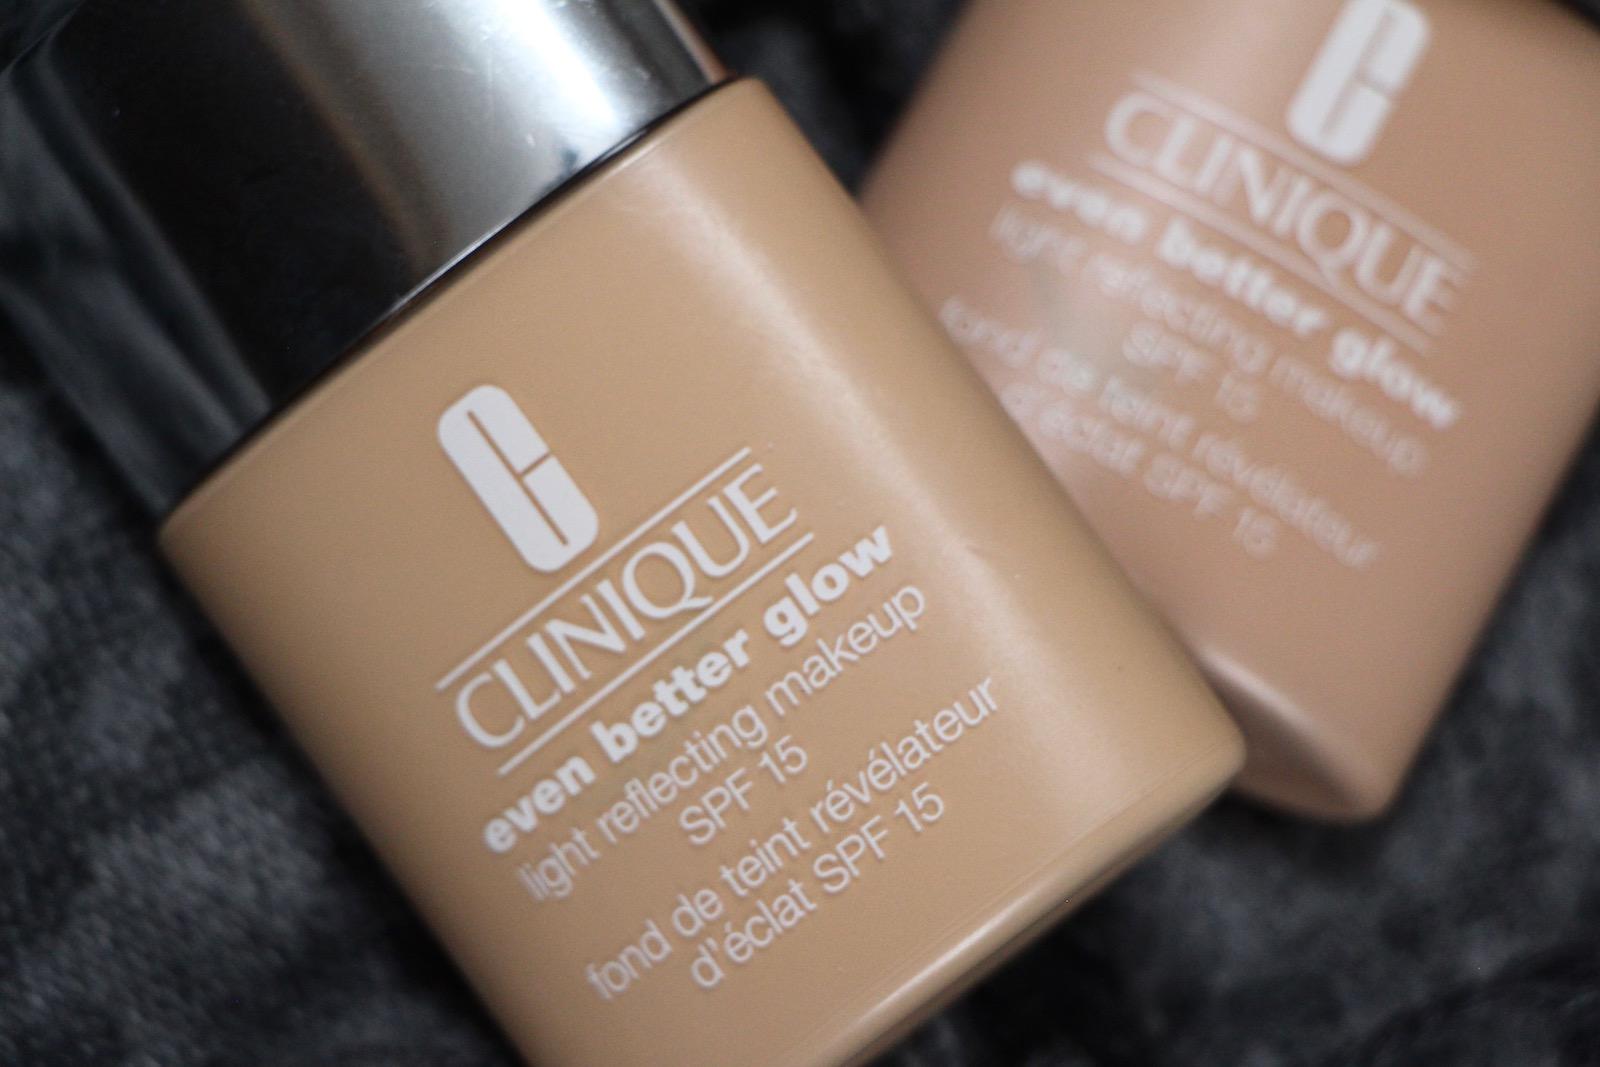 clinique even better glow foundation review